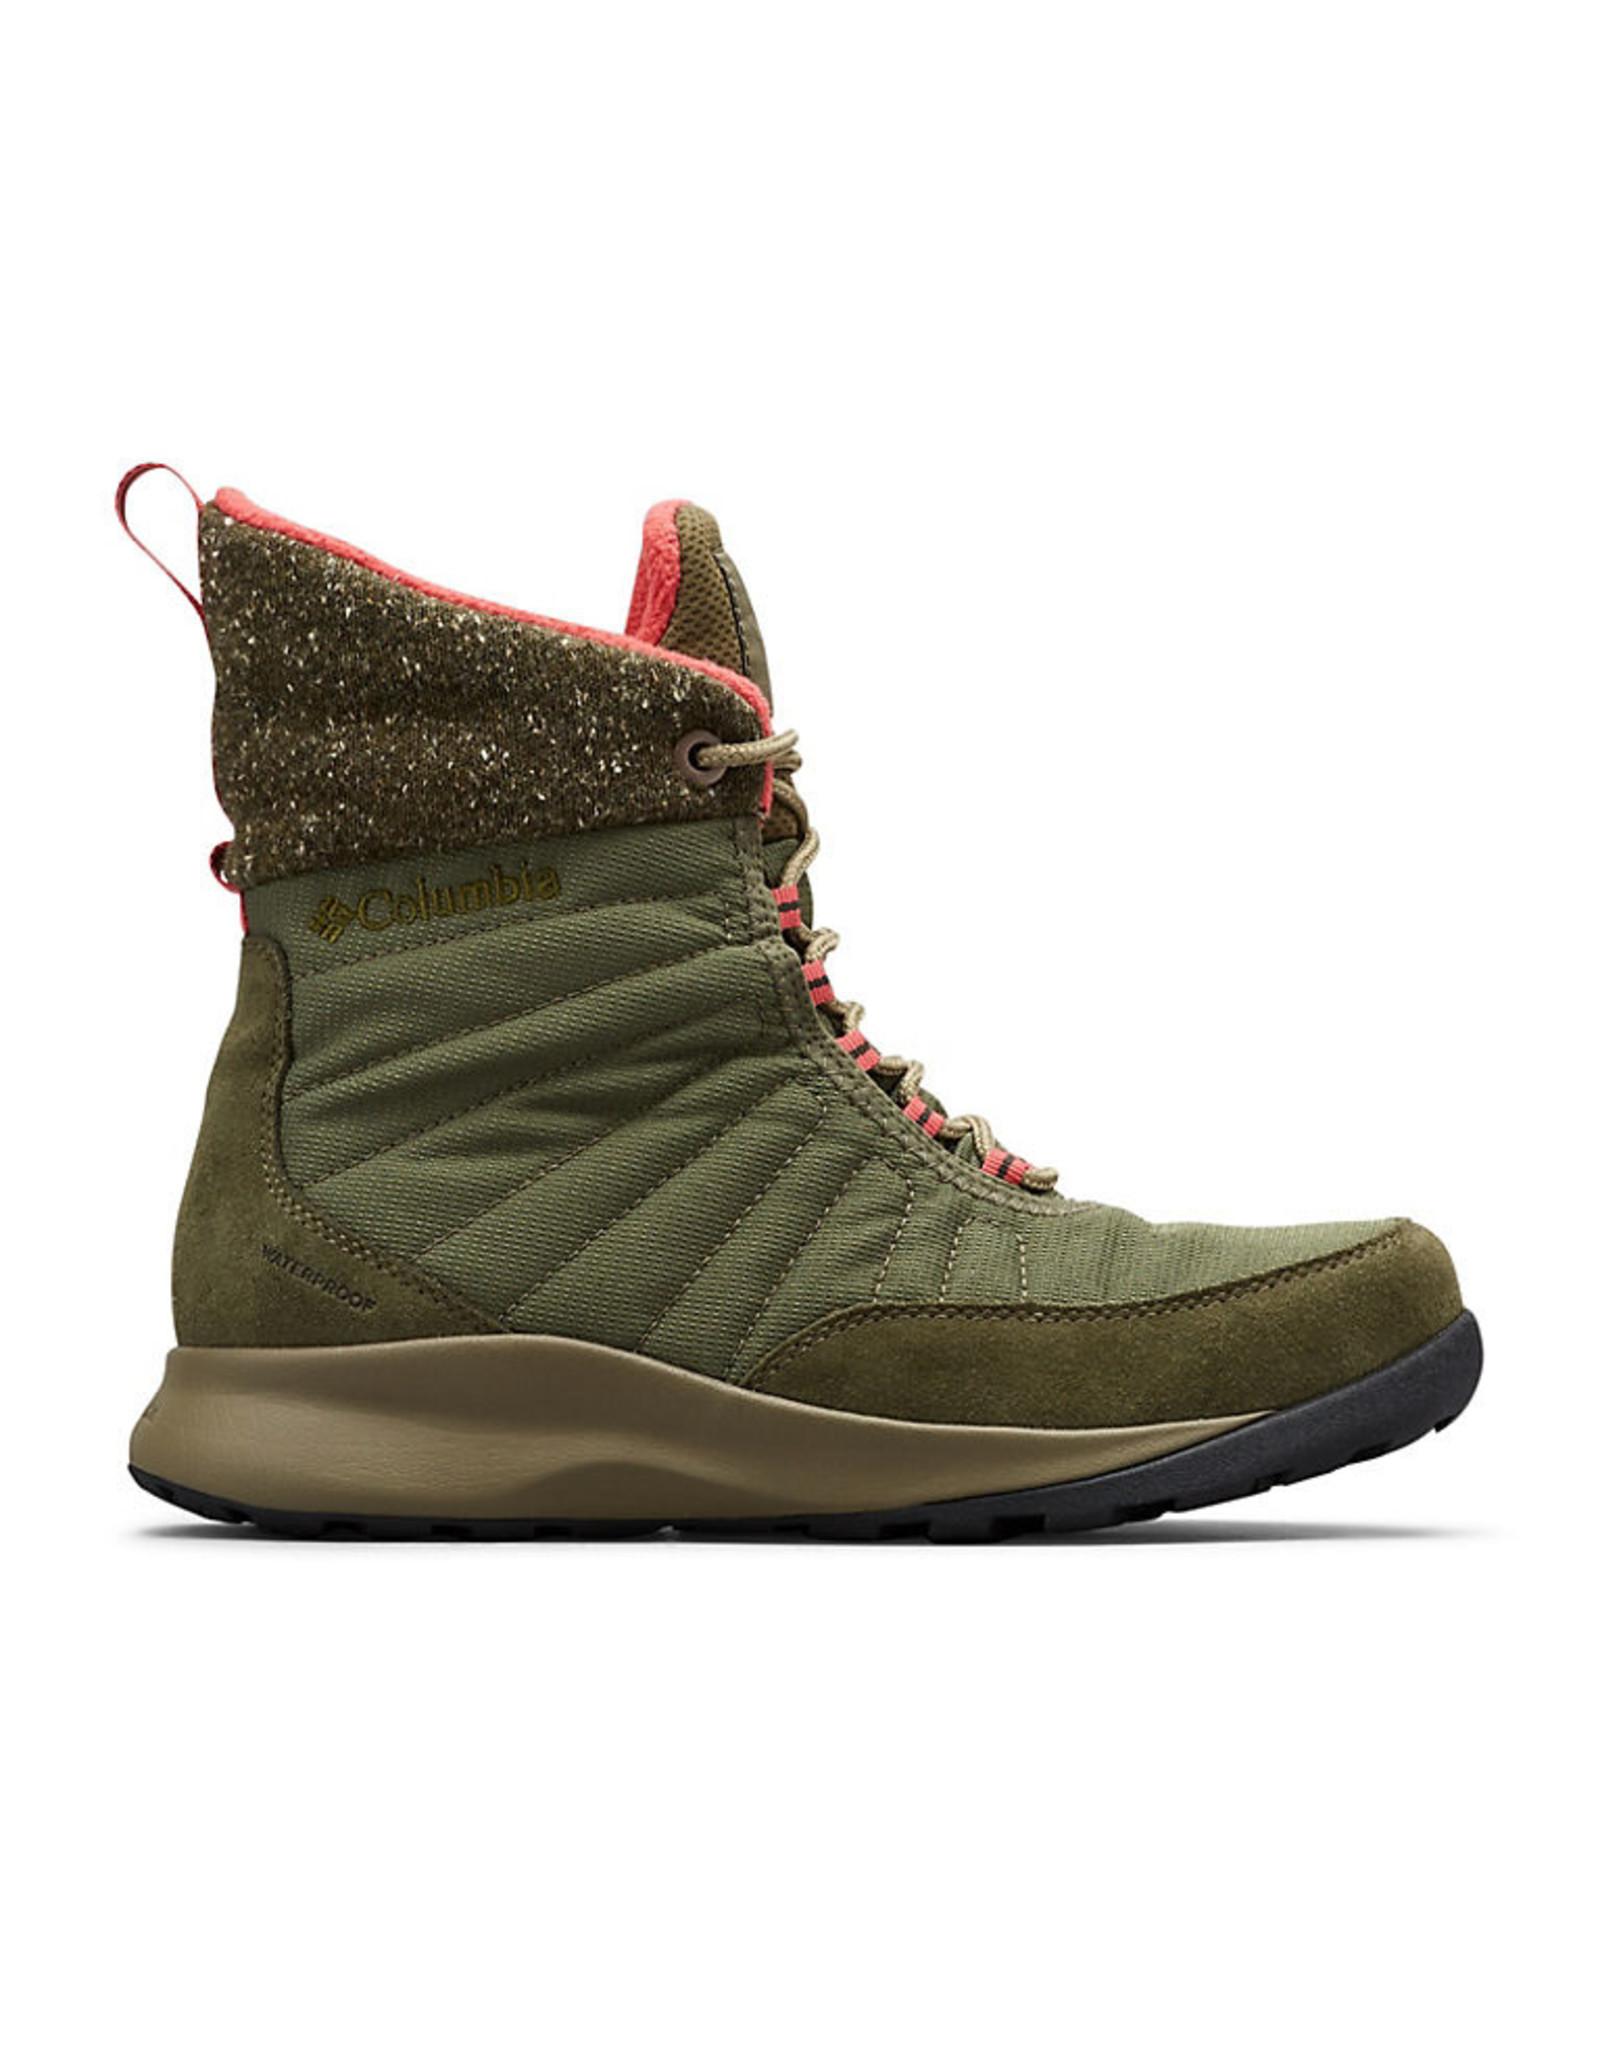 Columbia Columbia - Women's Nikiski Boots